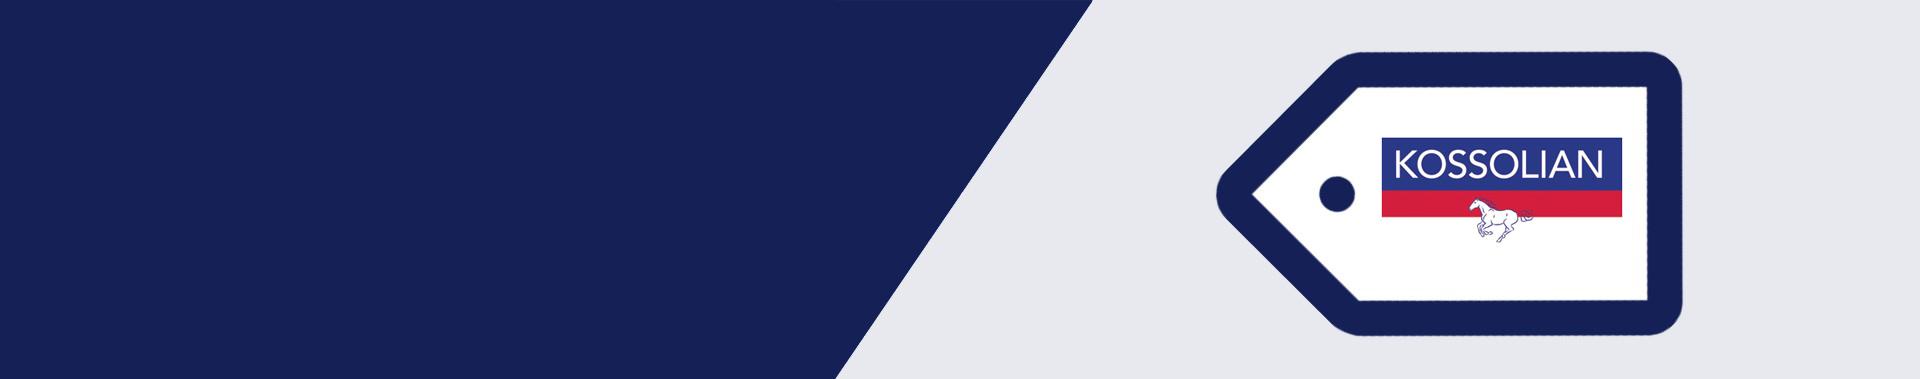 Kossolian